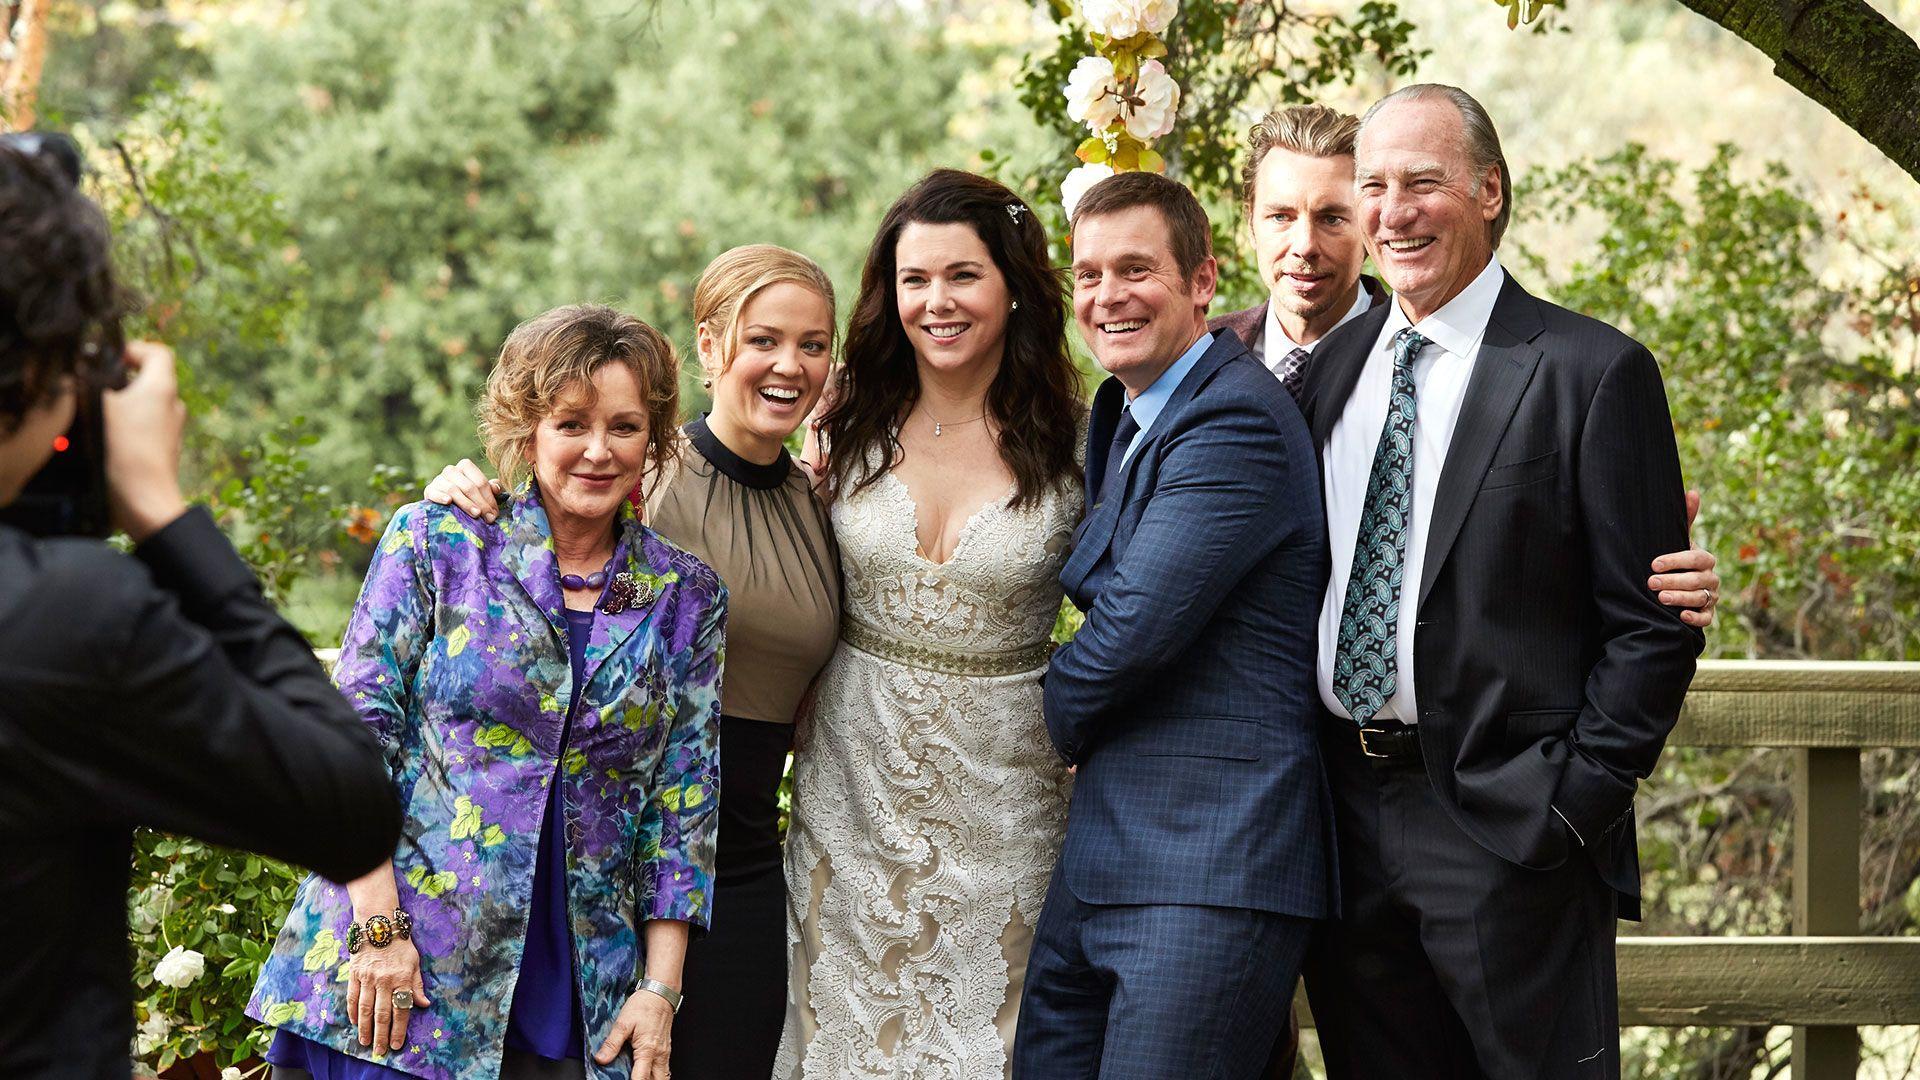 14+ Wedding tv shows on netflix ideas